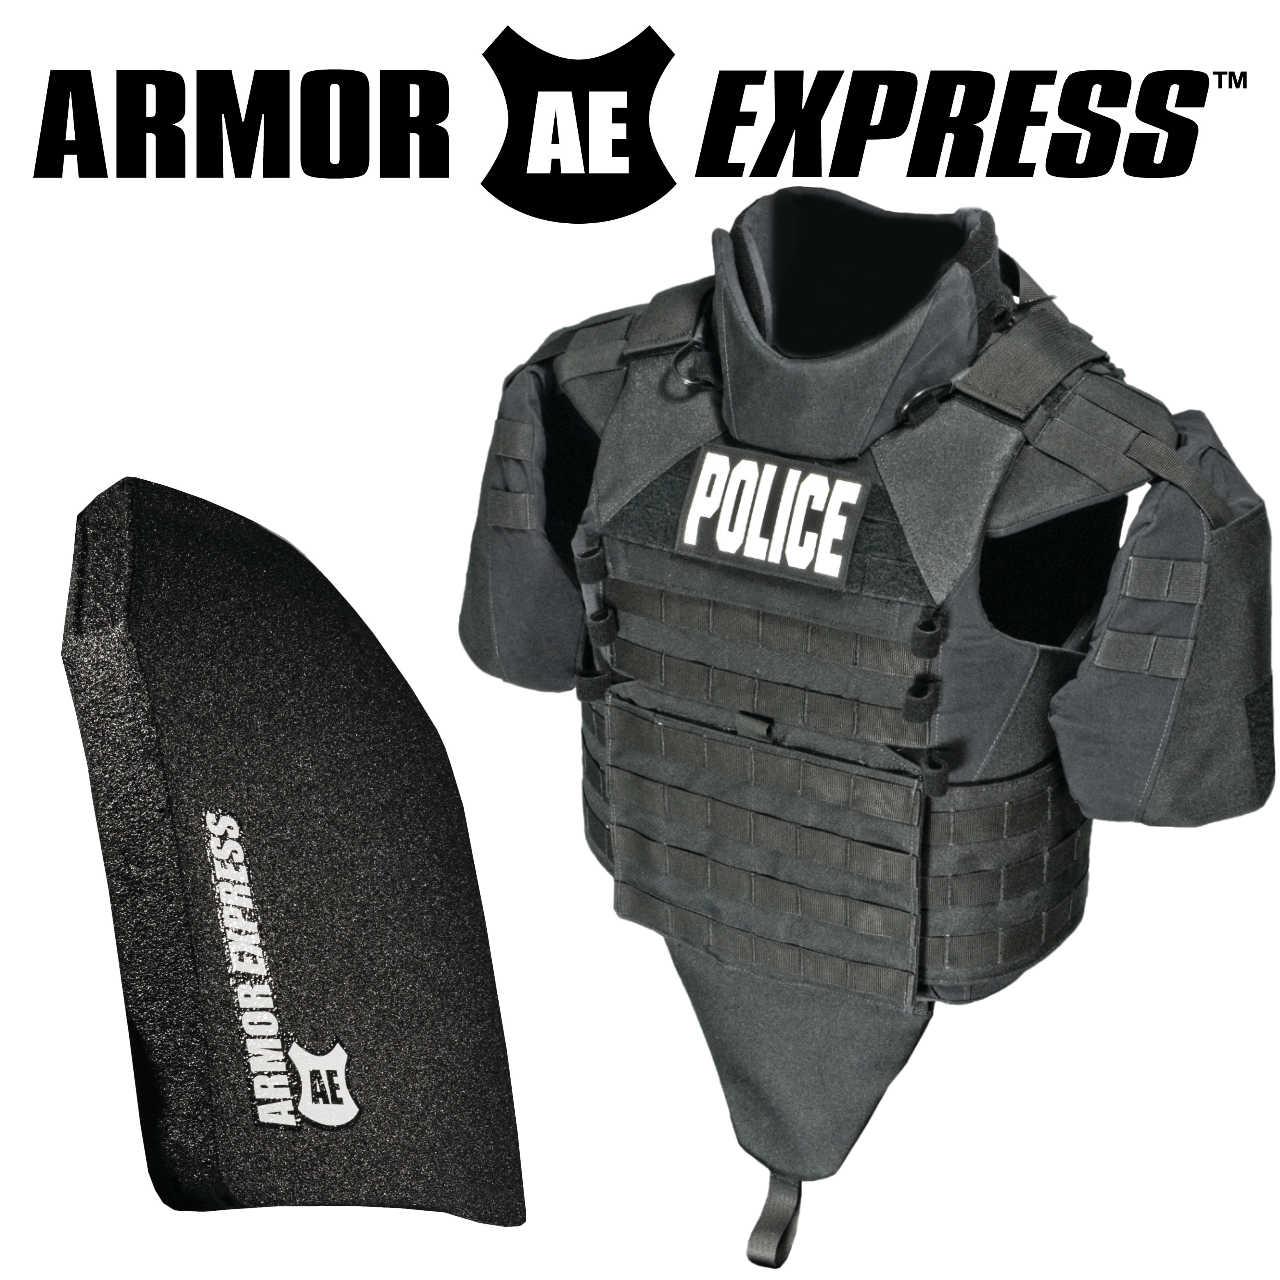 ARMOR EXPRESS - BrandImage(thumb)